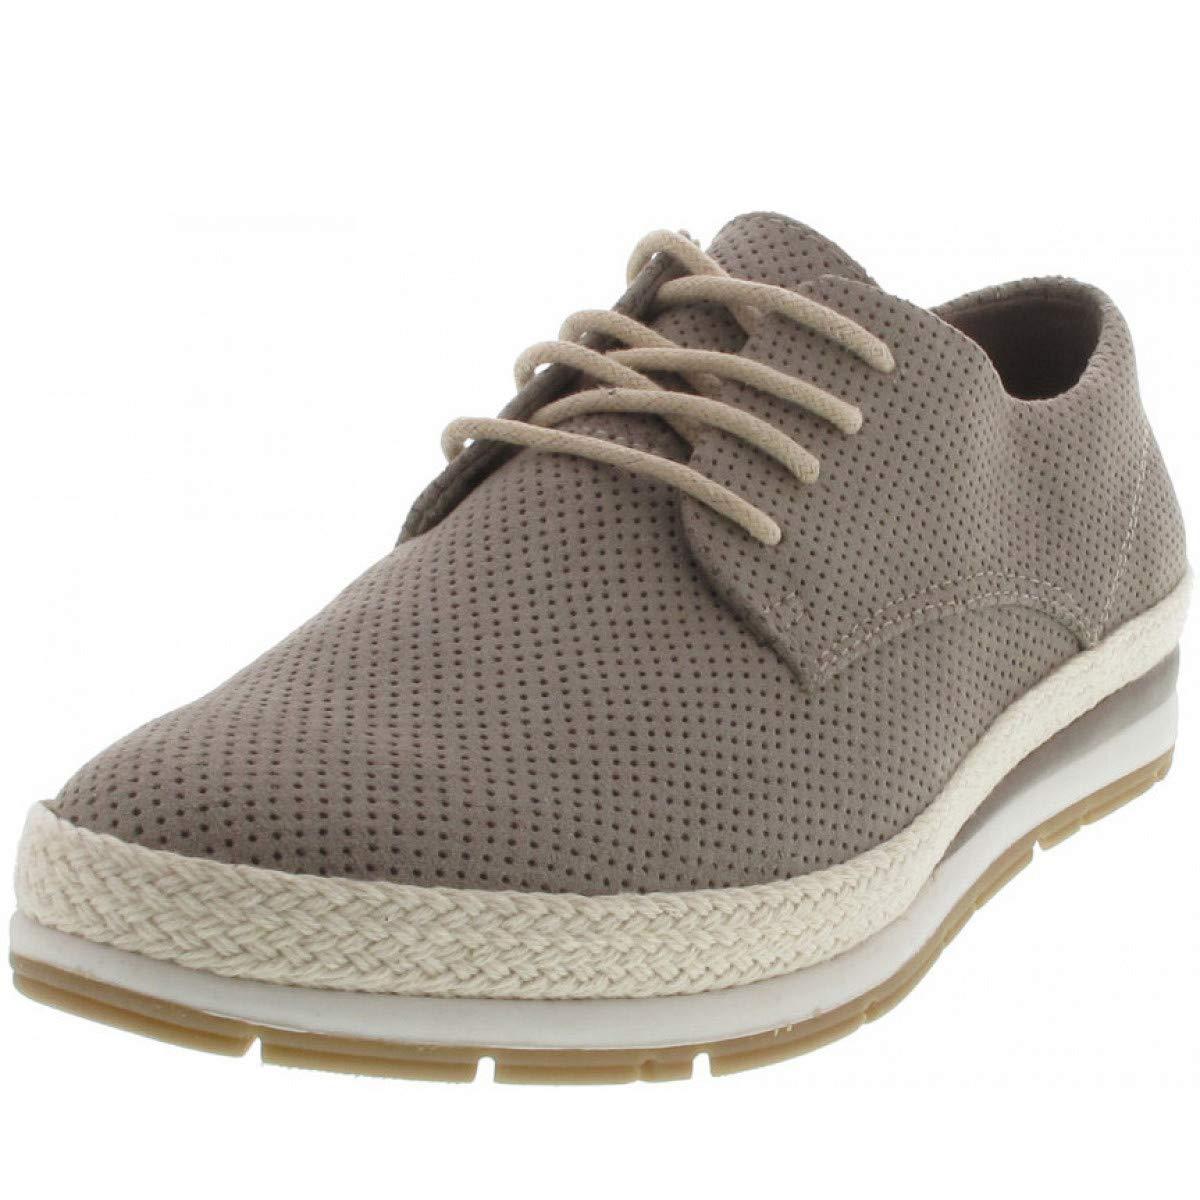 MARCO TOZZI 2 23603 20 341: : Schuhe & Handtaschen